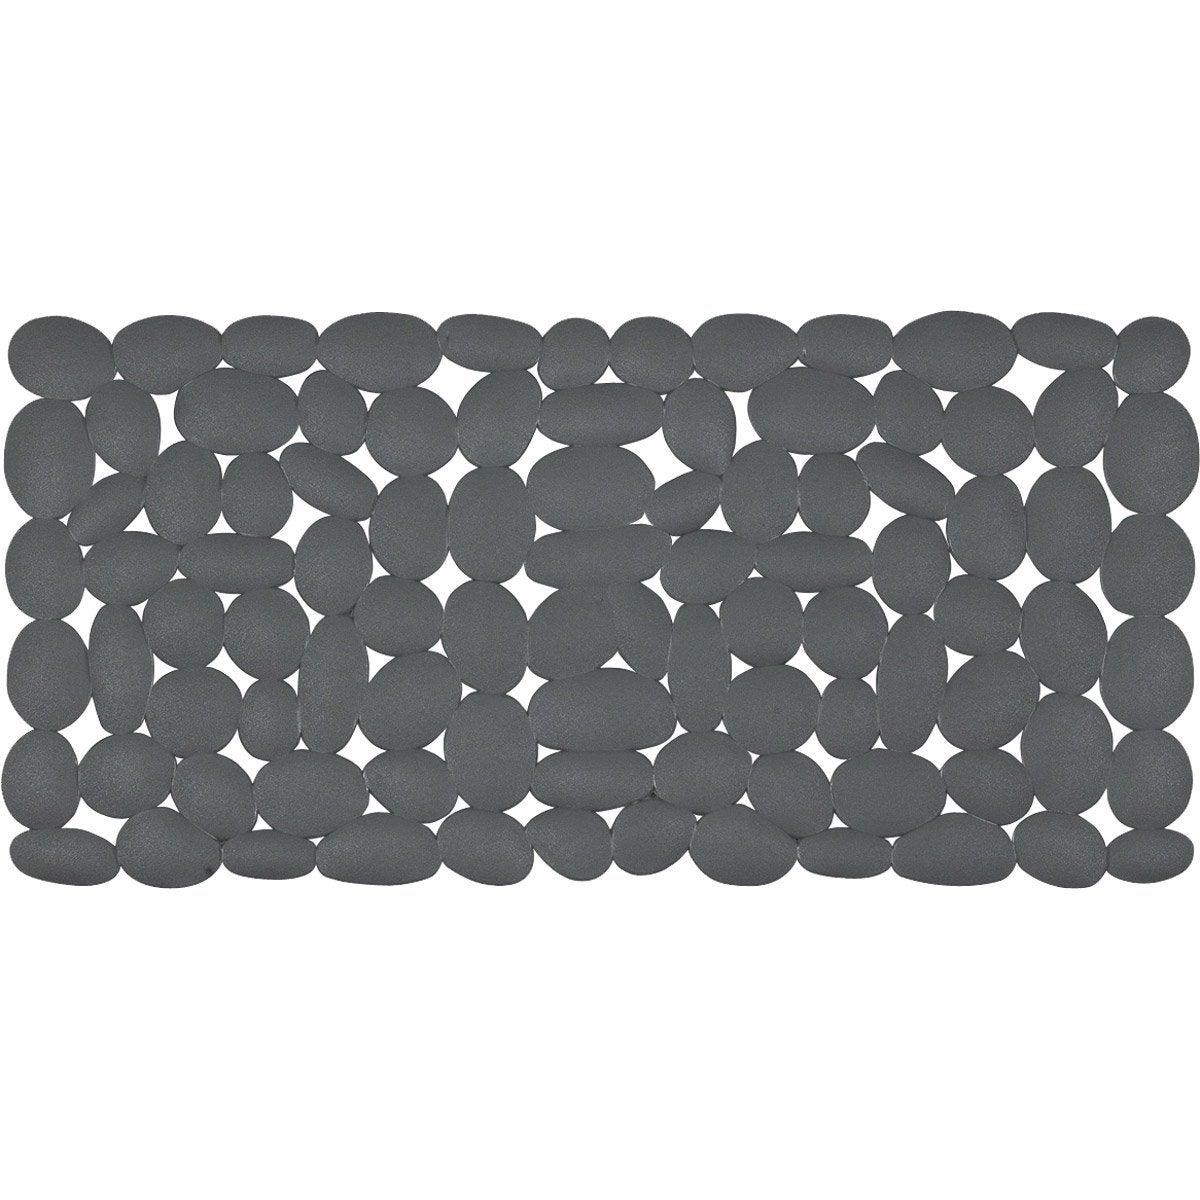 tapis antidrapant gris pour baignoire marathon - Tapis Salle De Bain Antiderapant